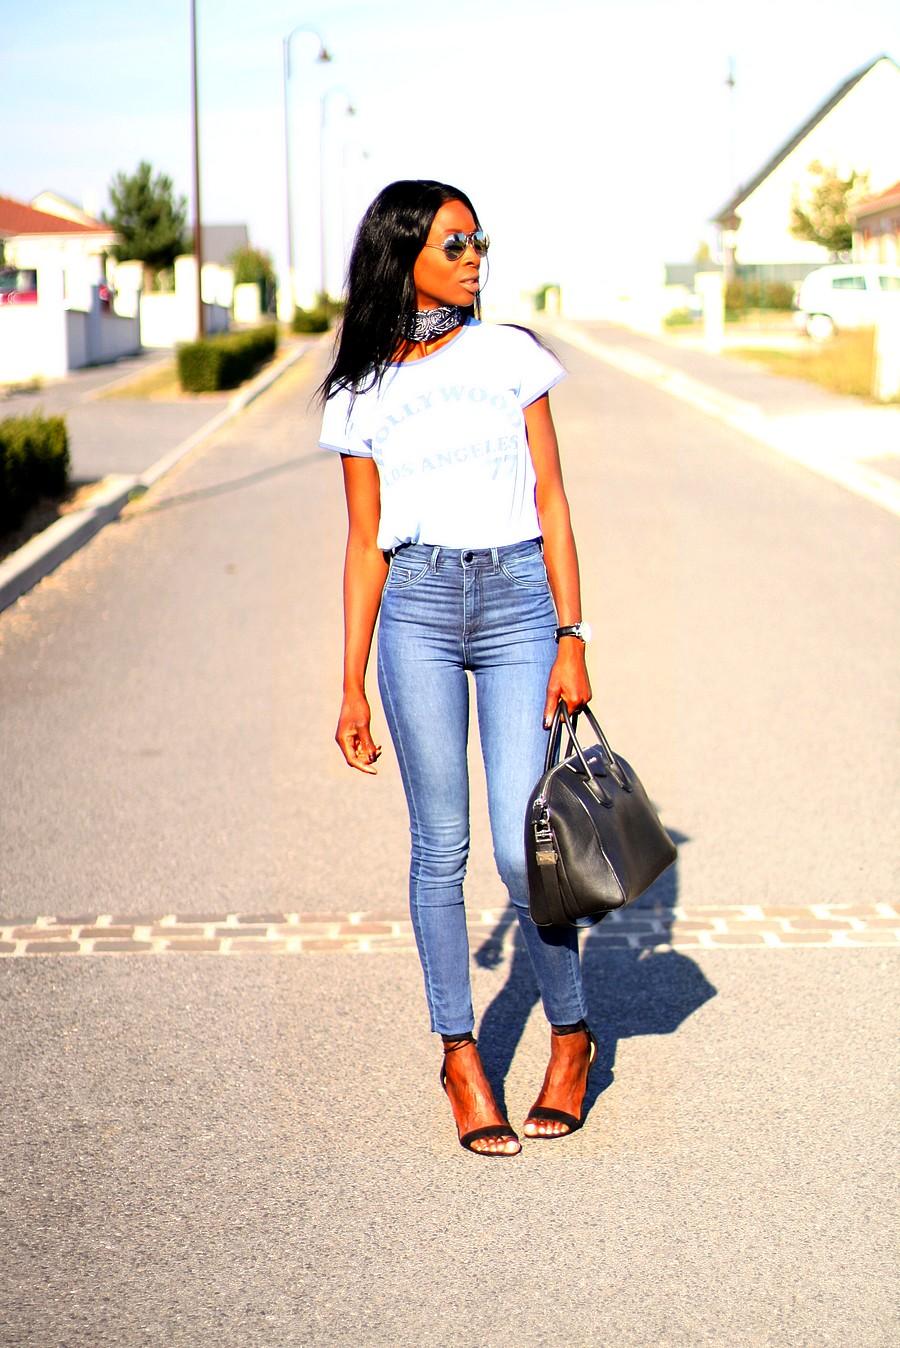 rayban-lunettes-miroir-sac-givenchy-antigona-mom-jeans-taille-haute-ootd